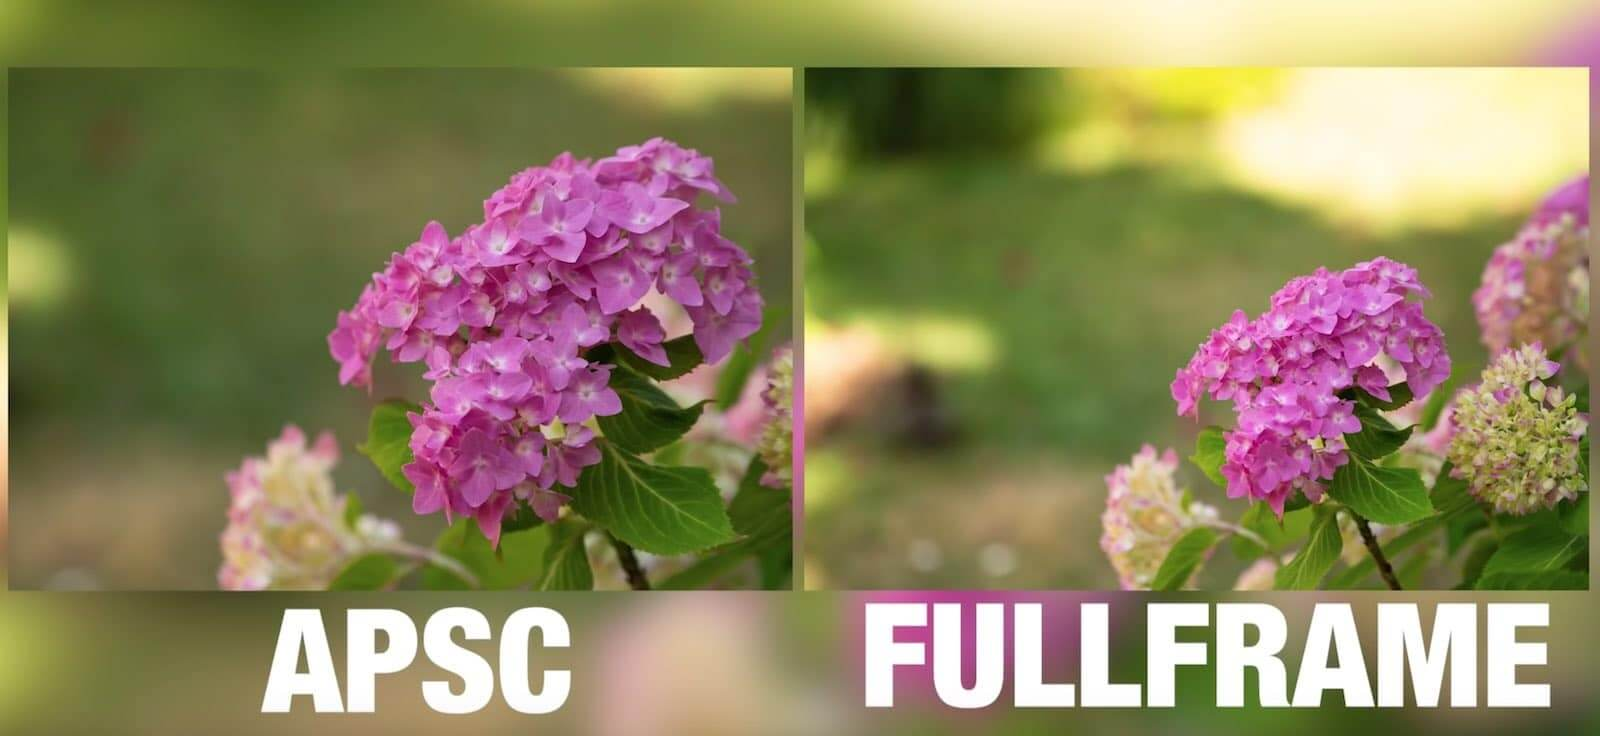 Camera Sensor Size Explained - ASP C vs Full Frame - Shallow Depth of Field